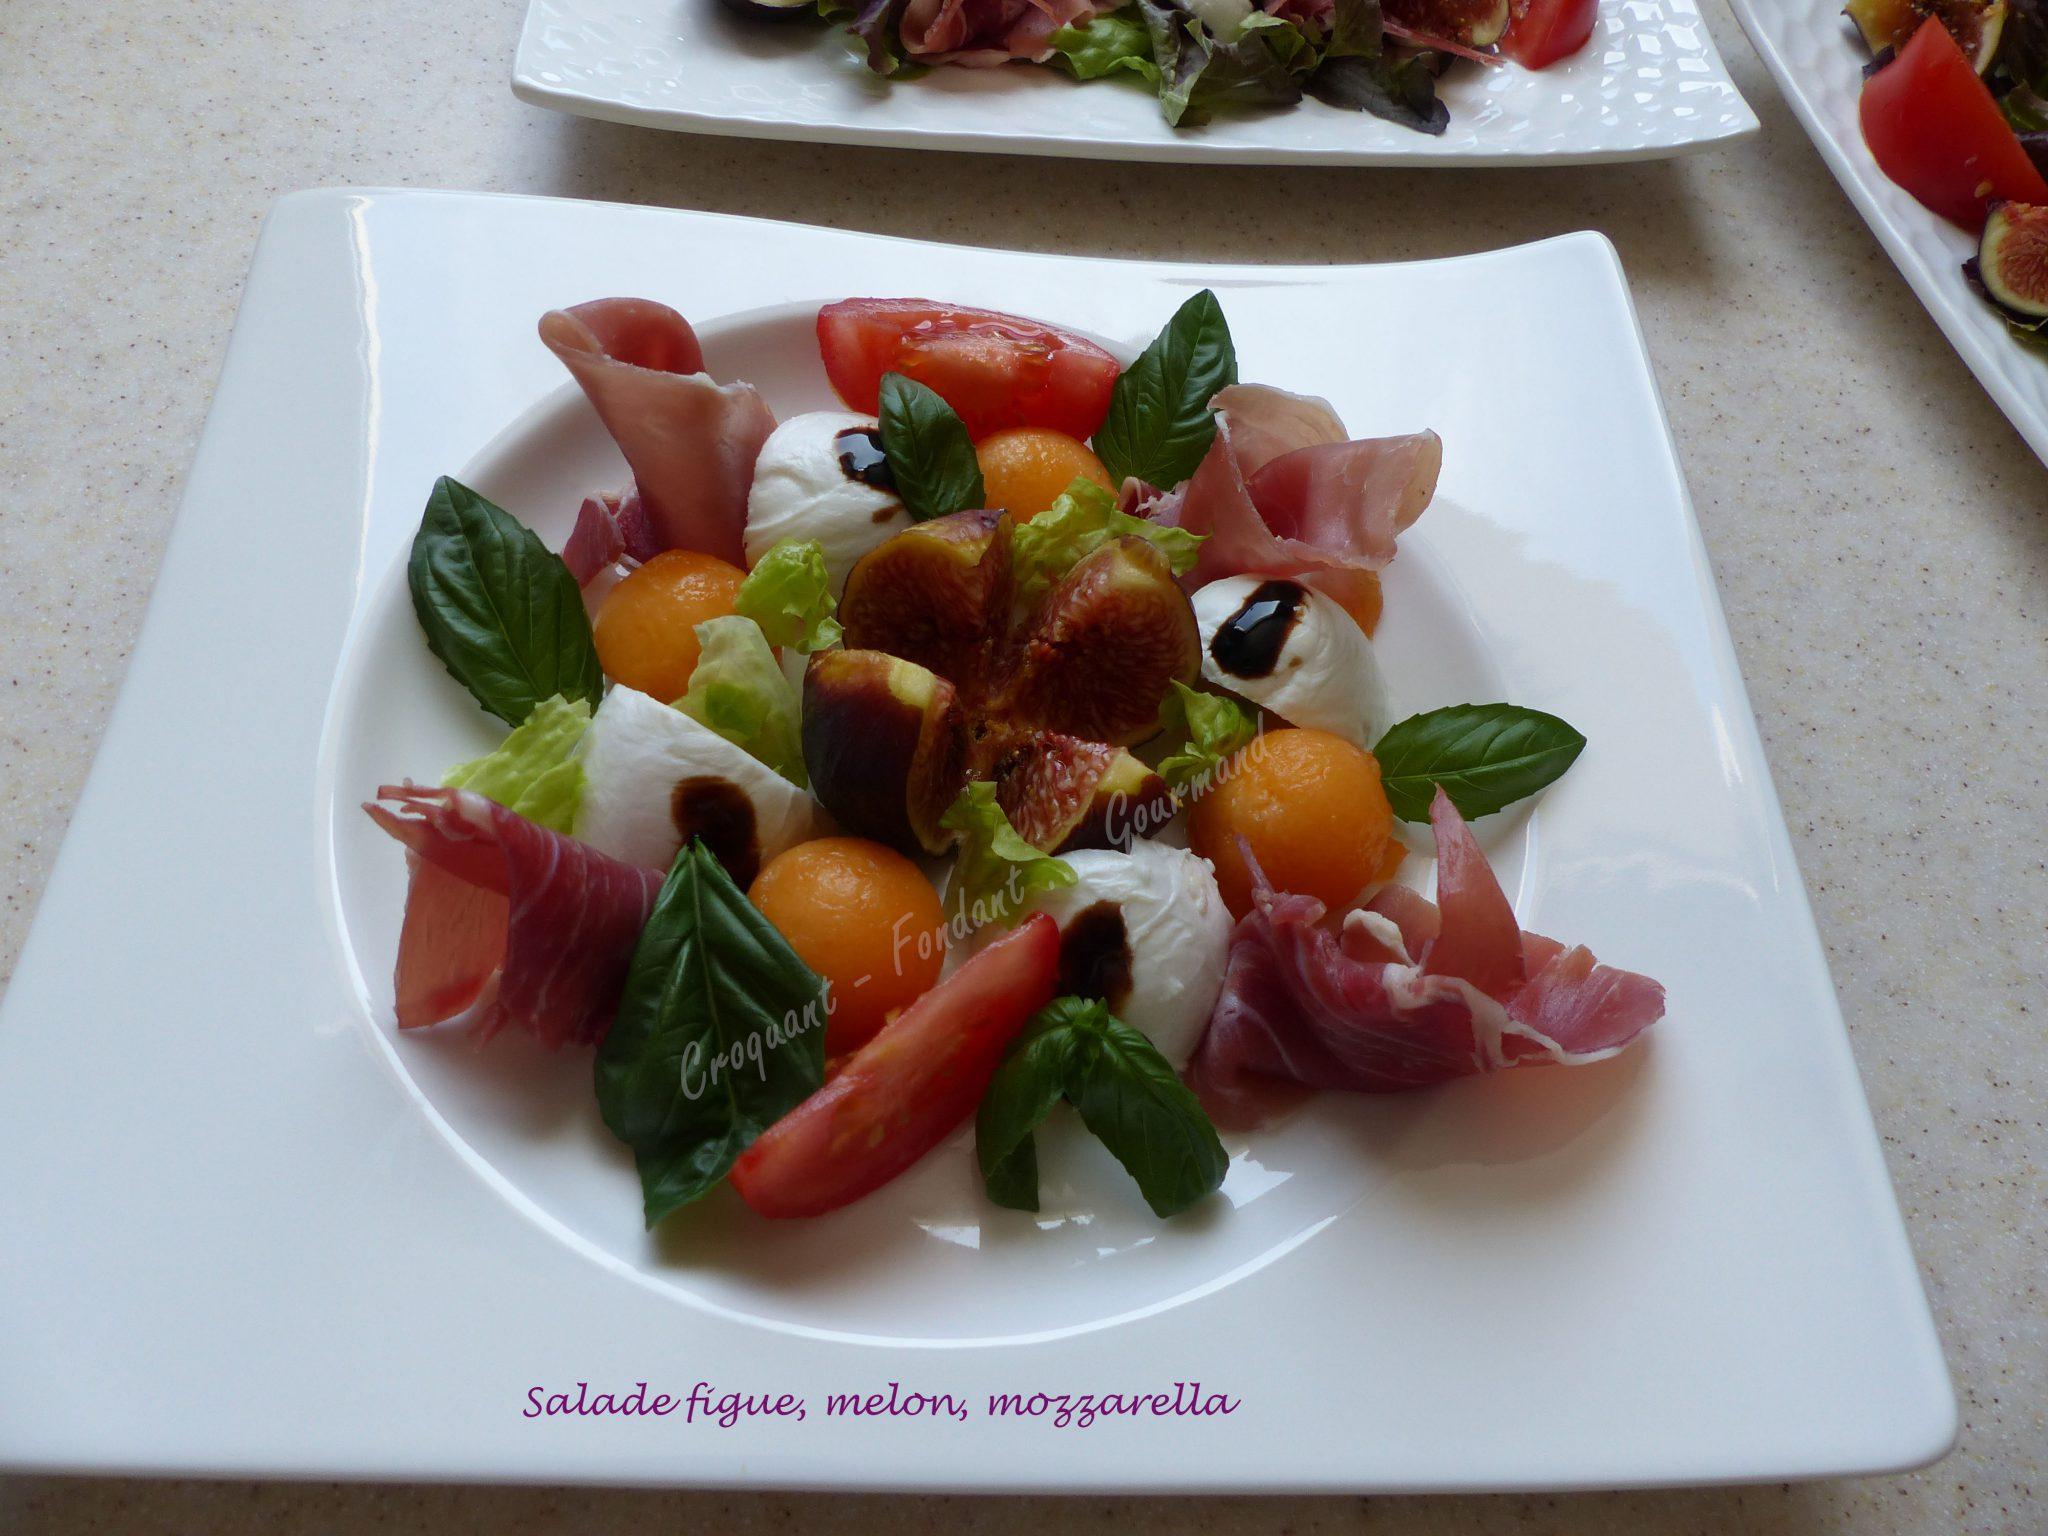 Salade Figue Melon Mozzarella P1050007 Croquant